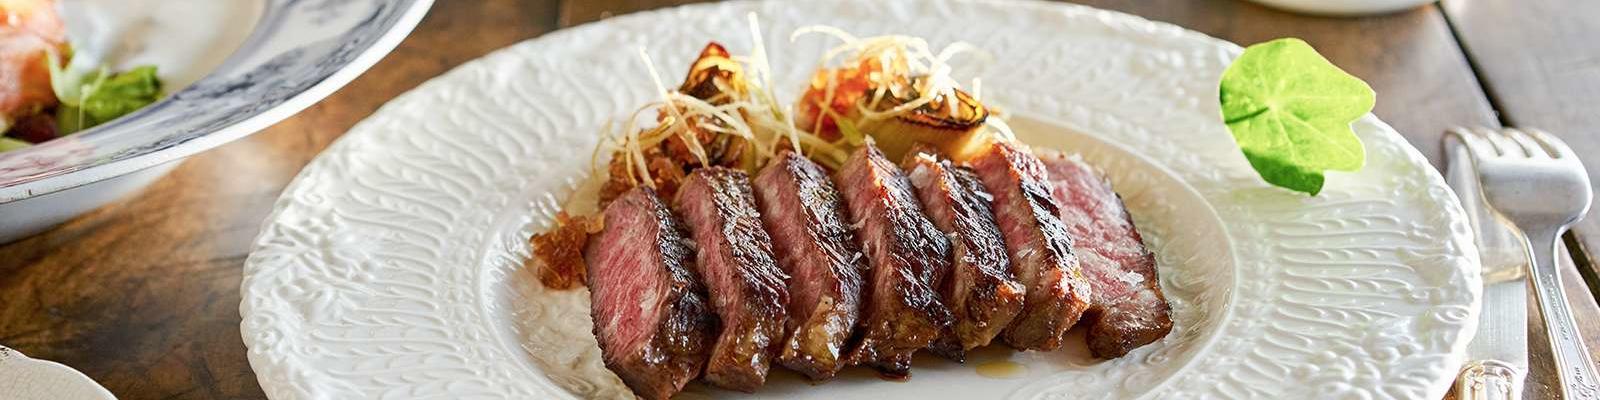 Steak entree at Share on Sun Princess (Photo: Princess Cruises)